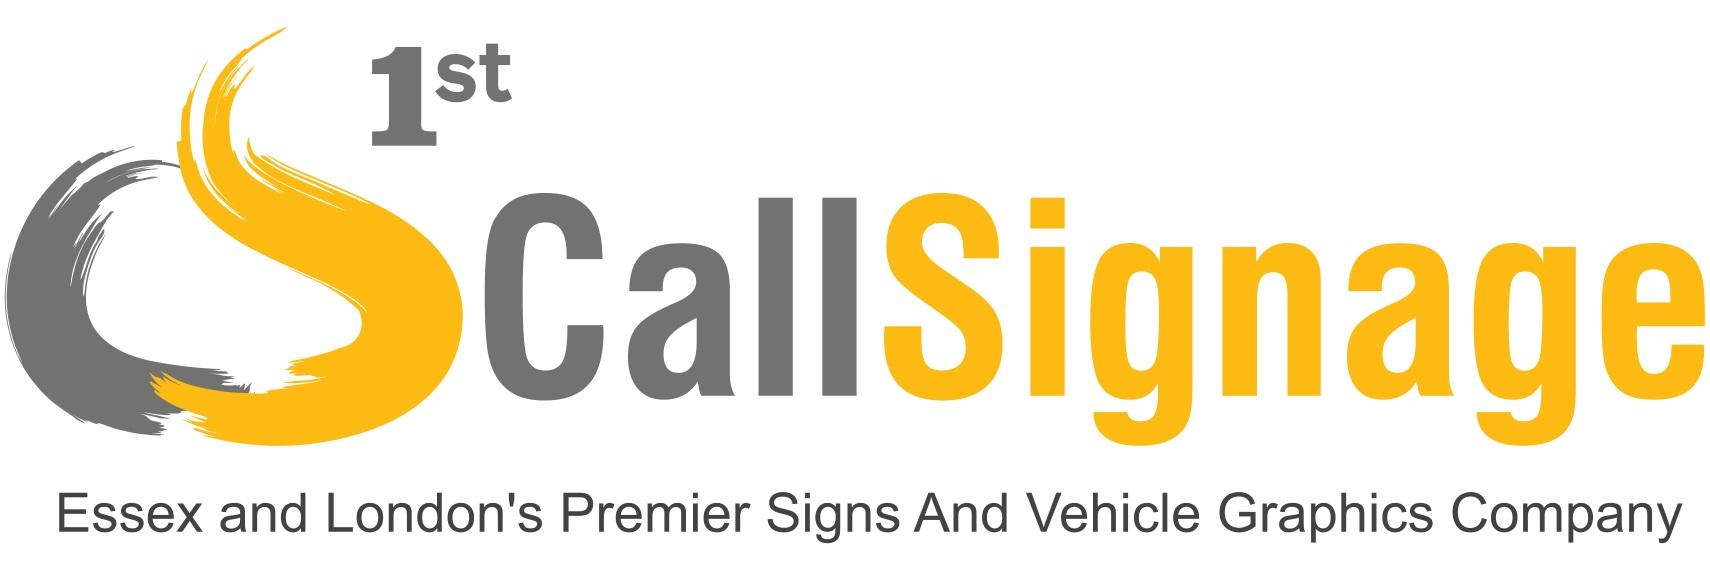 1st Call Signage